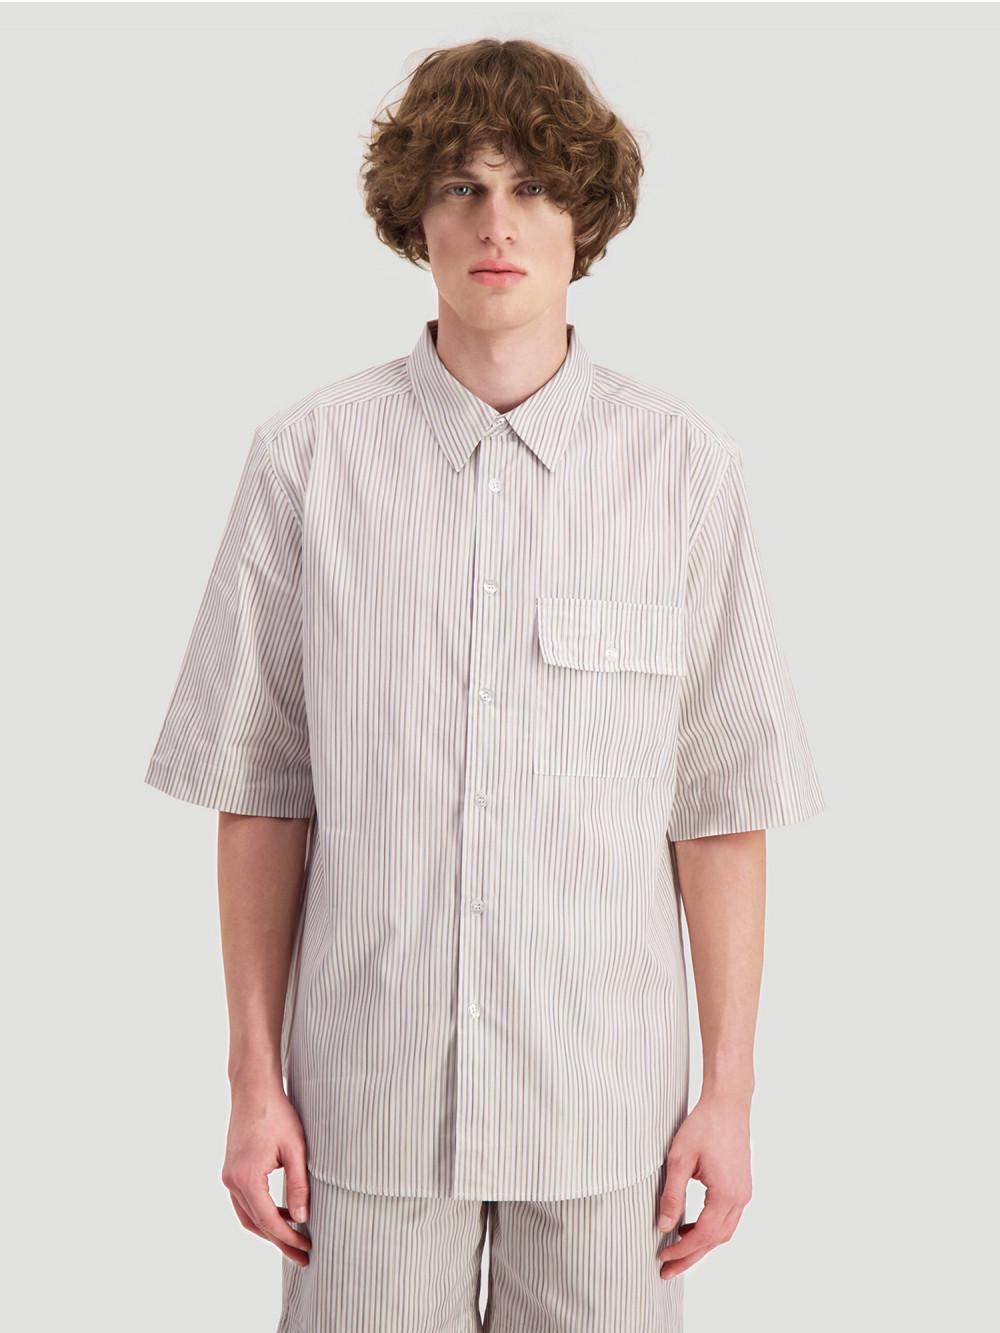 Blyg Shirt Yellow Stripes